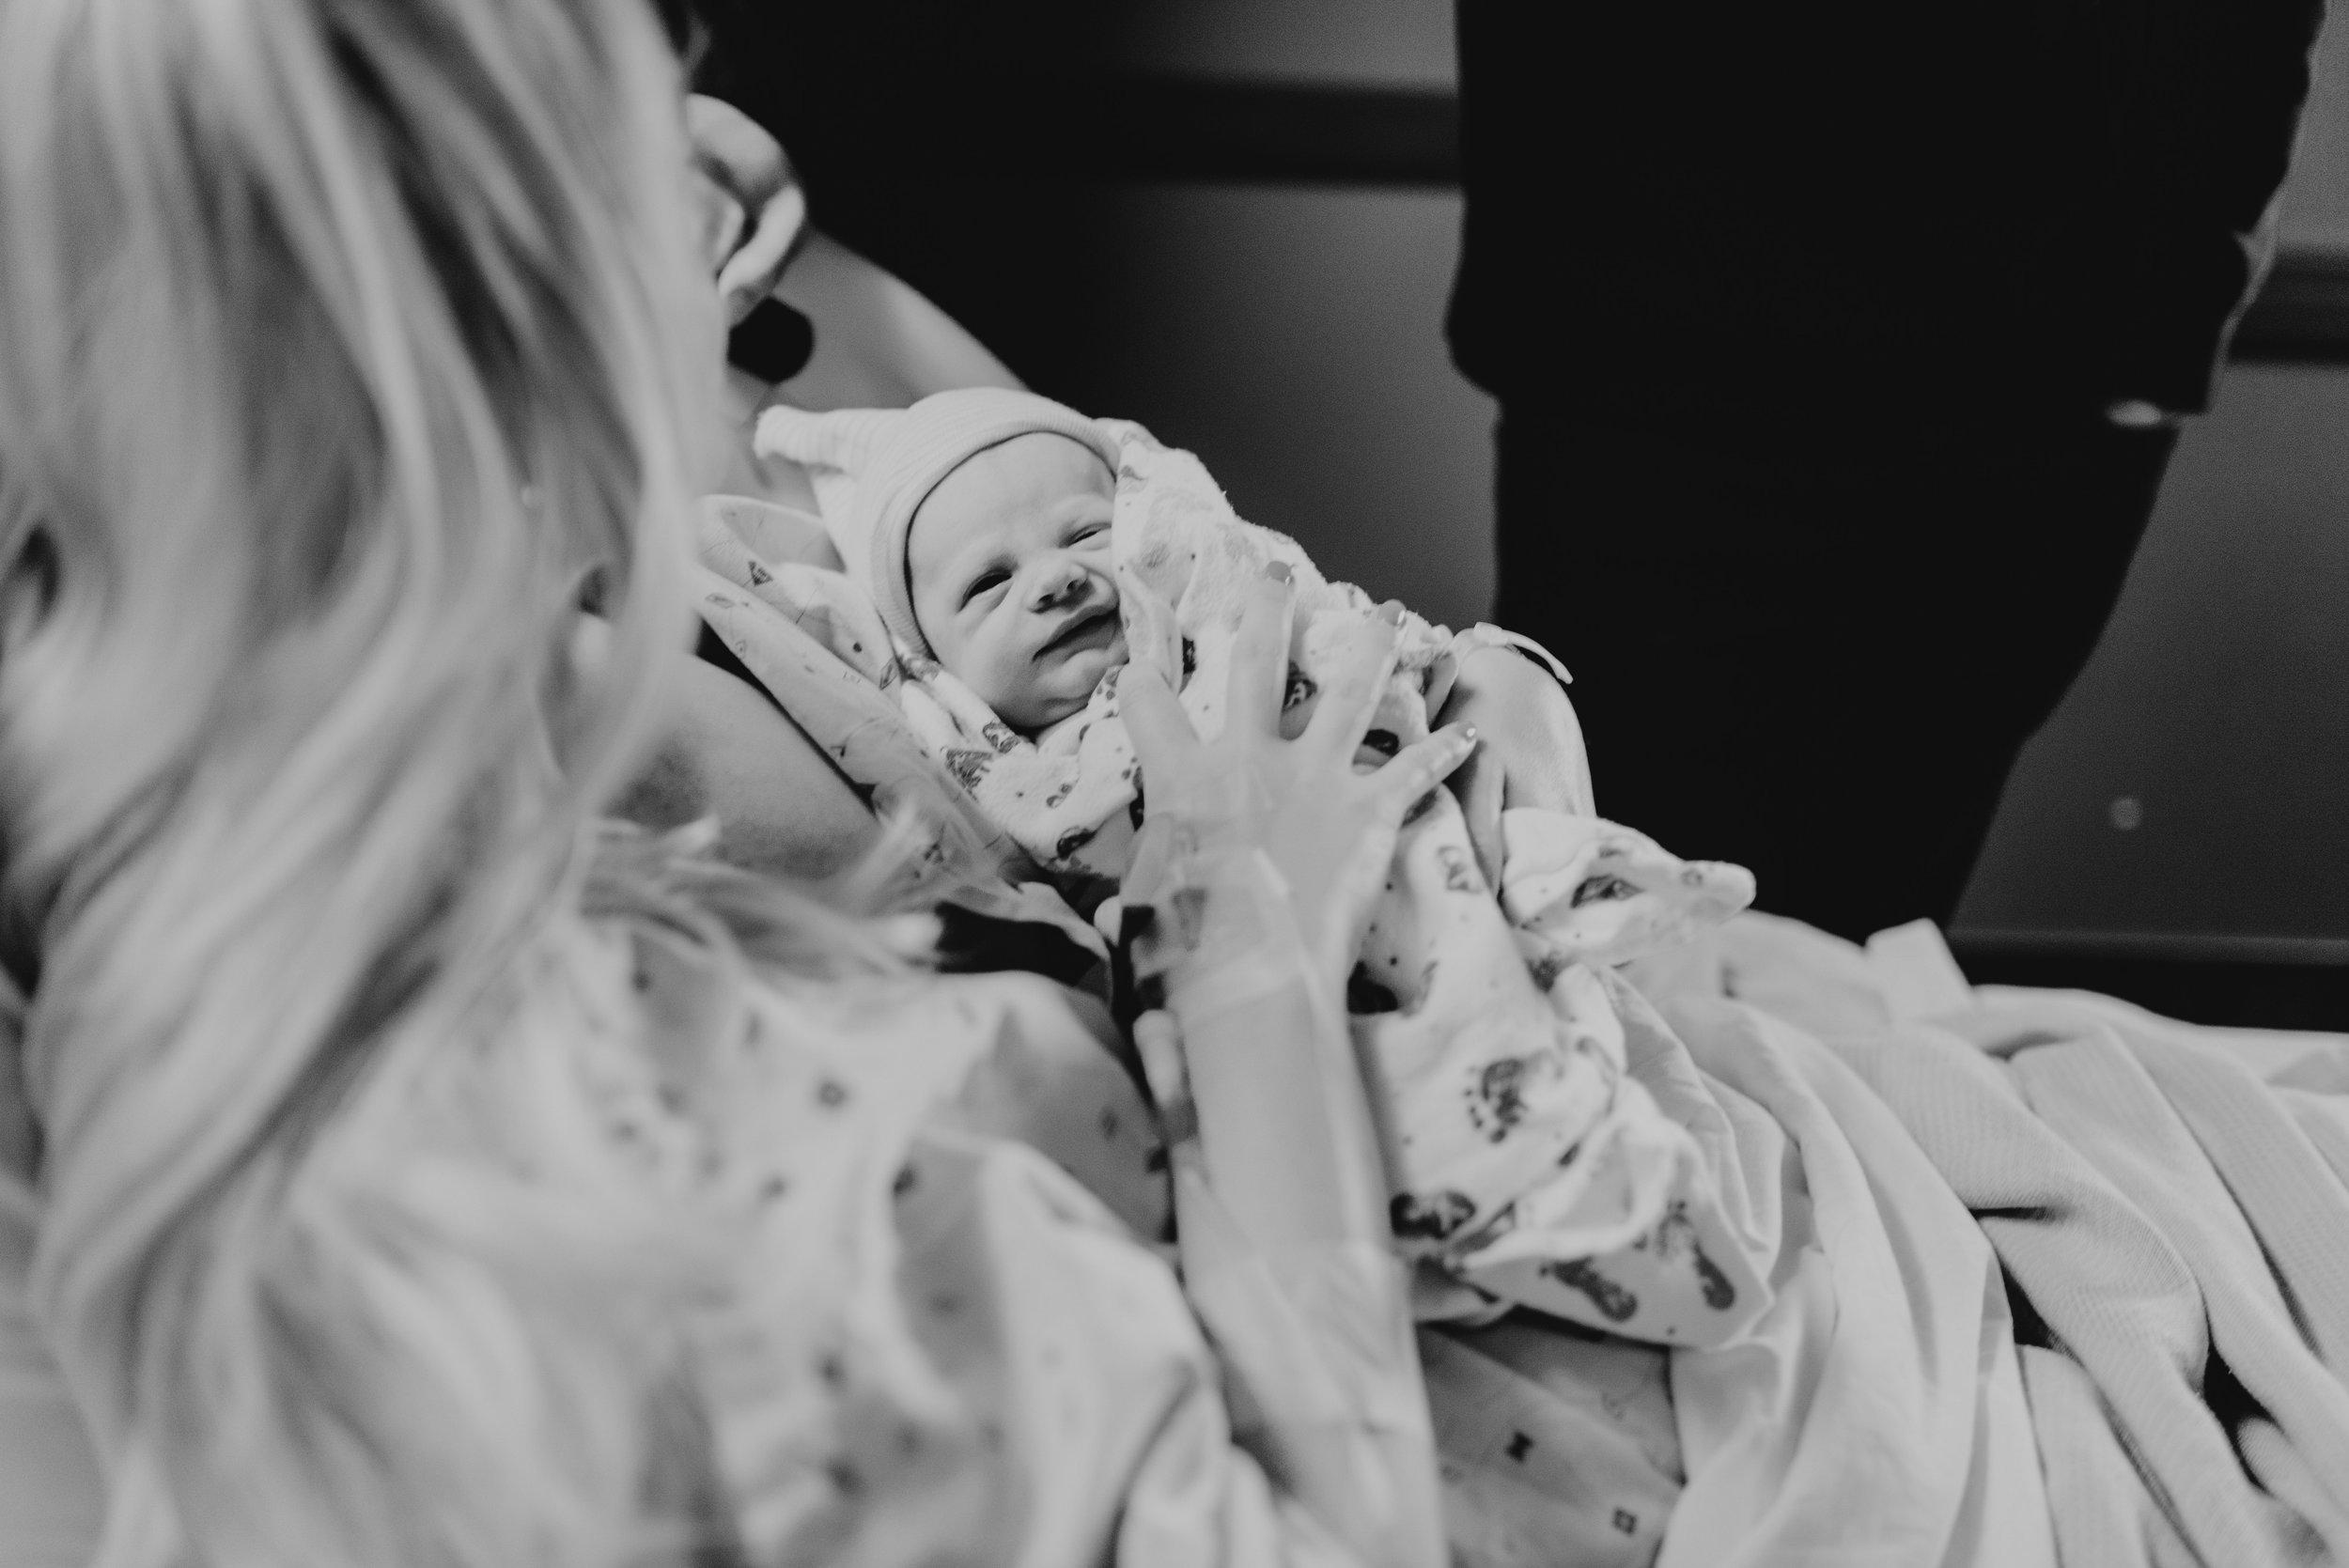 ELLIOT_birth-7318-2.jpg